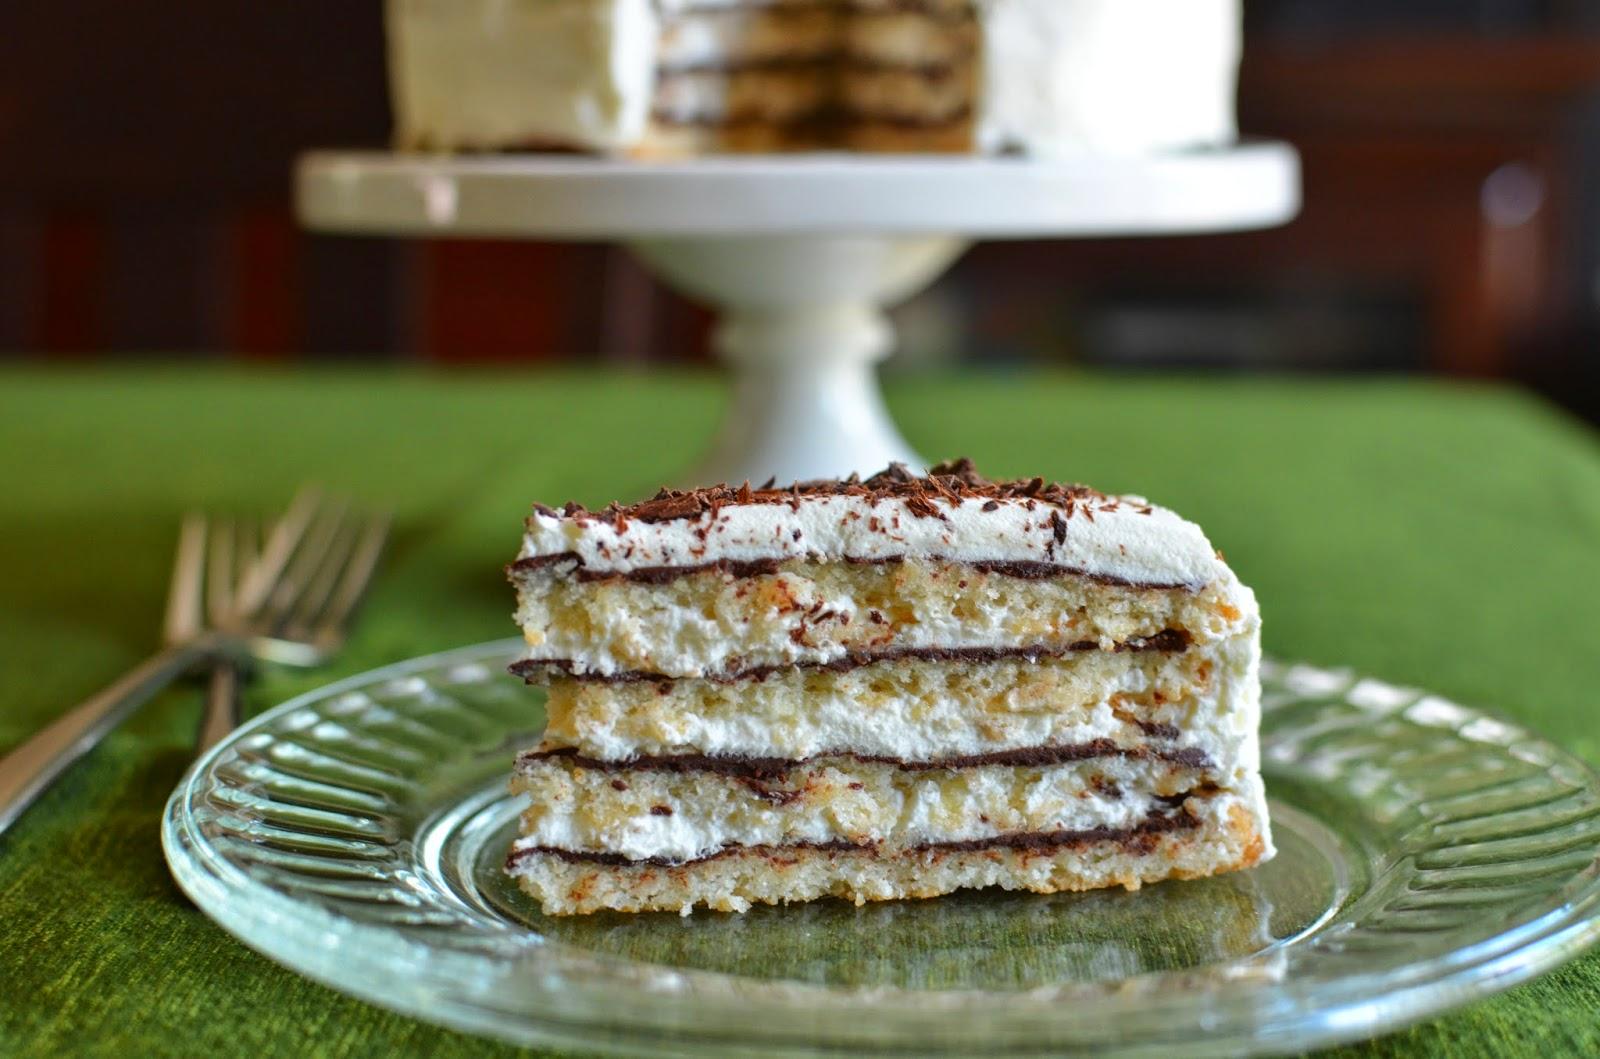 Almond Flour And Orange Seville Cake